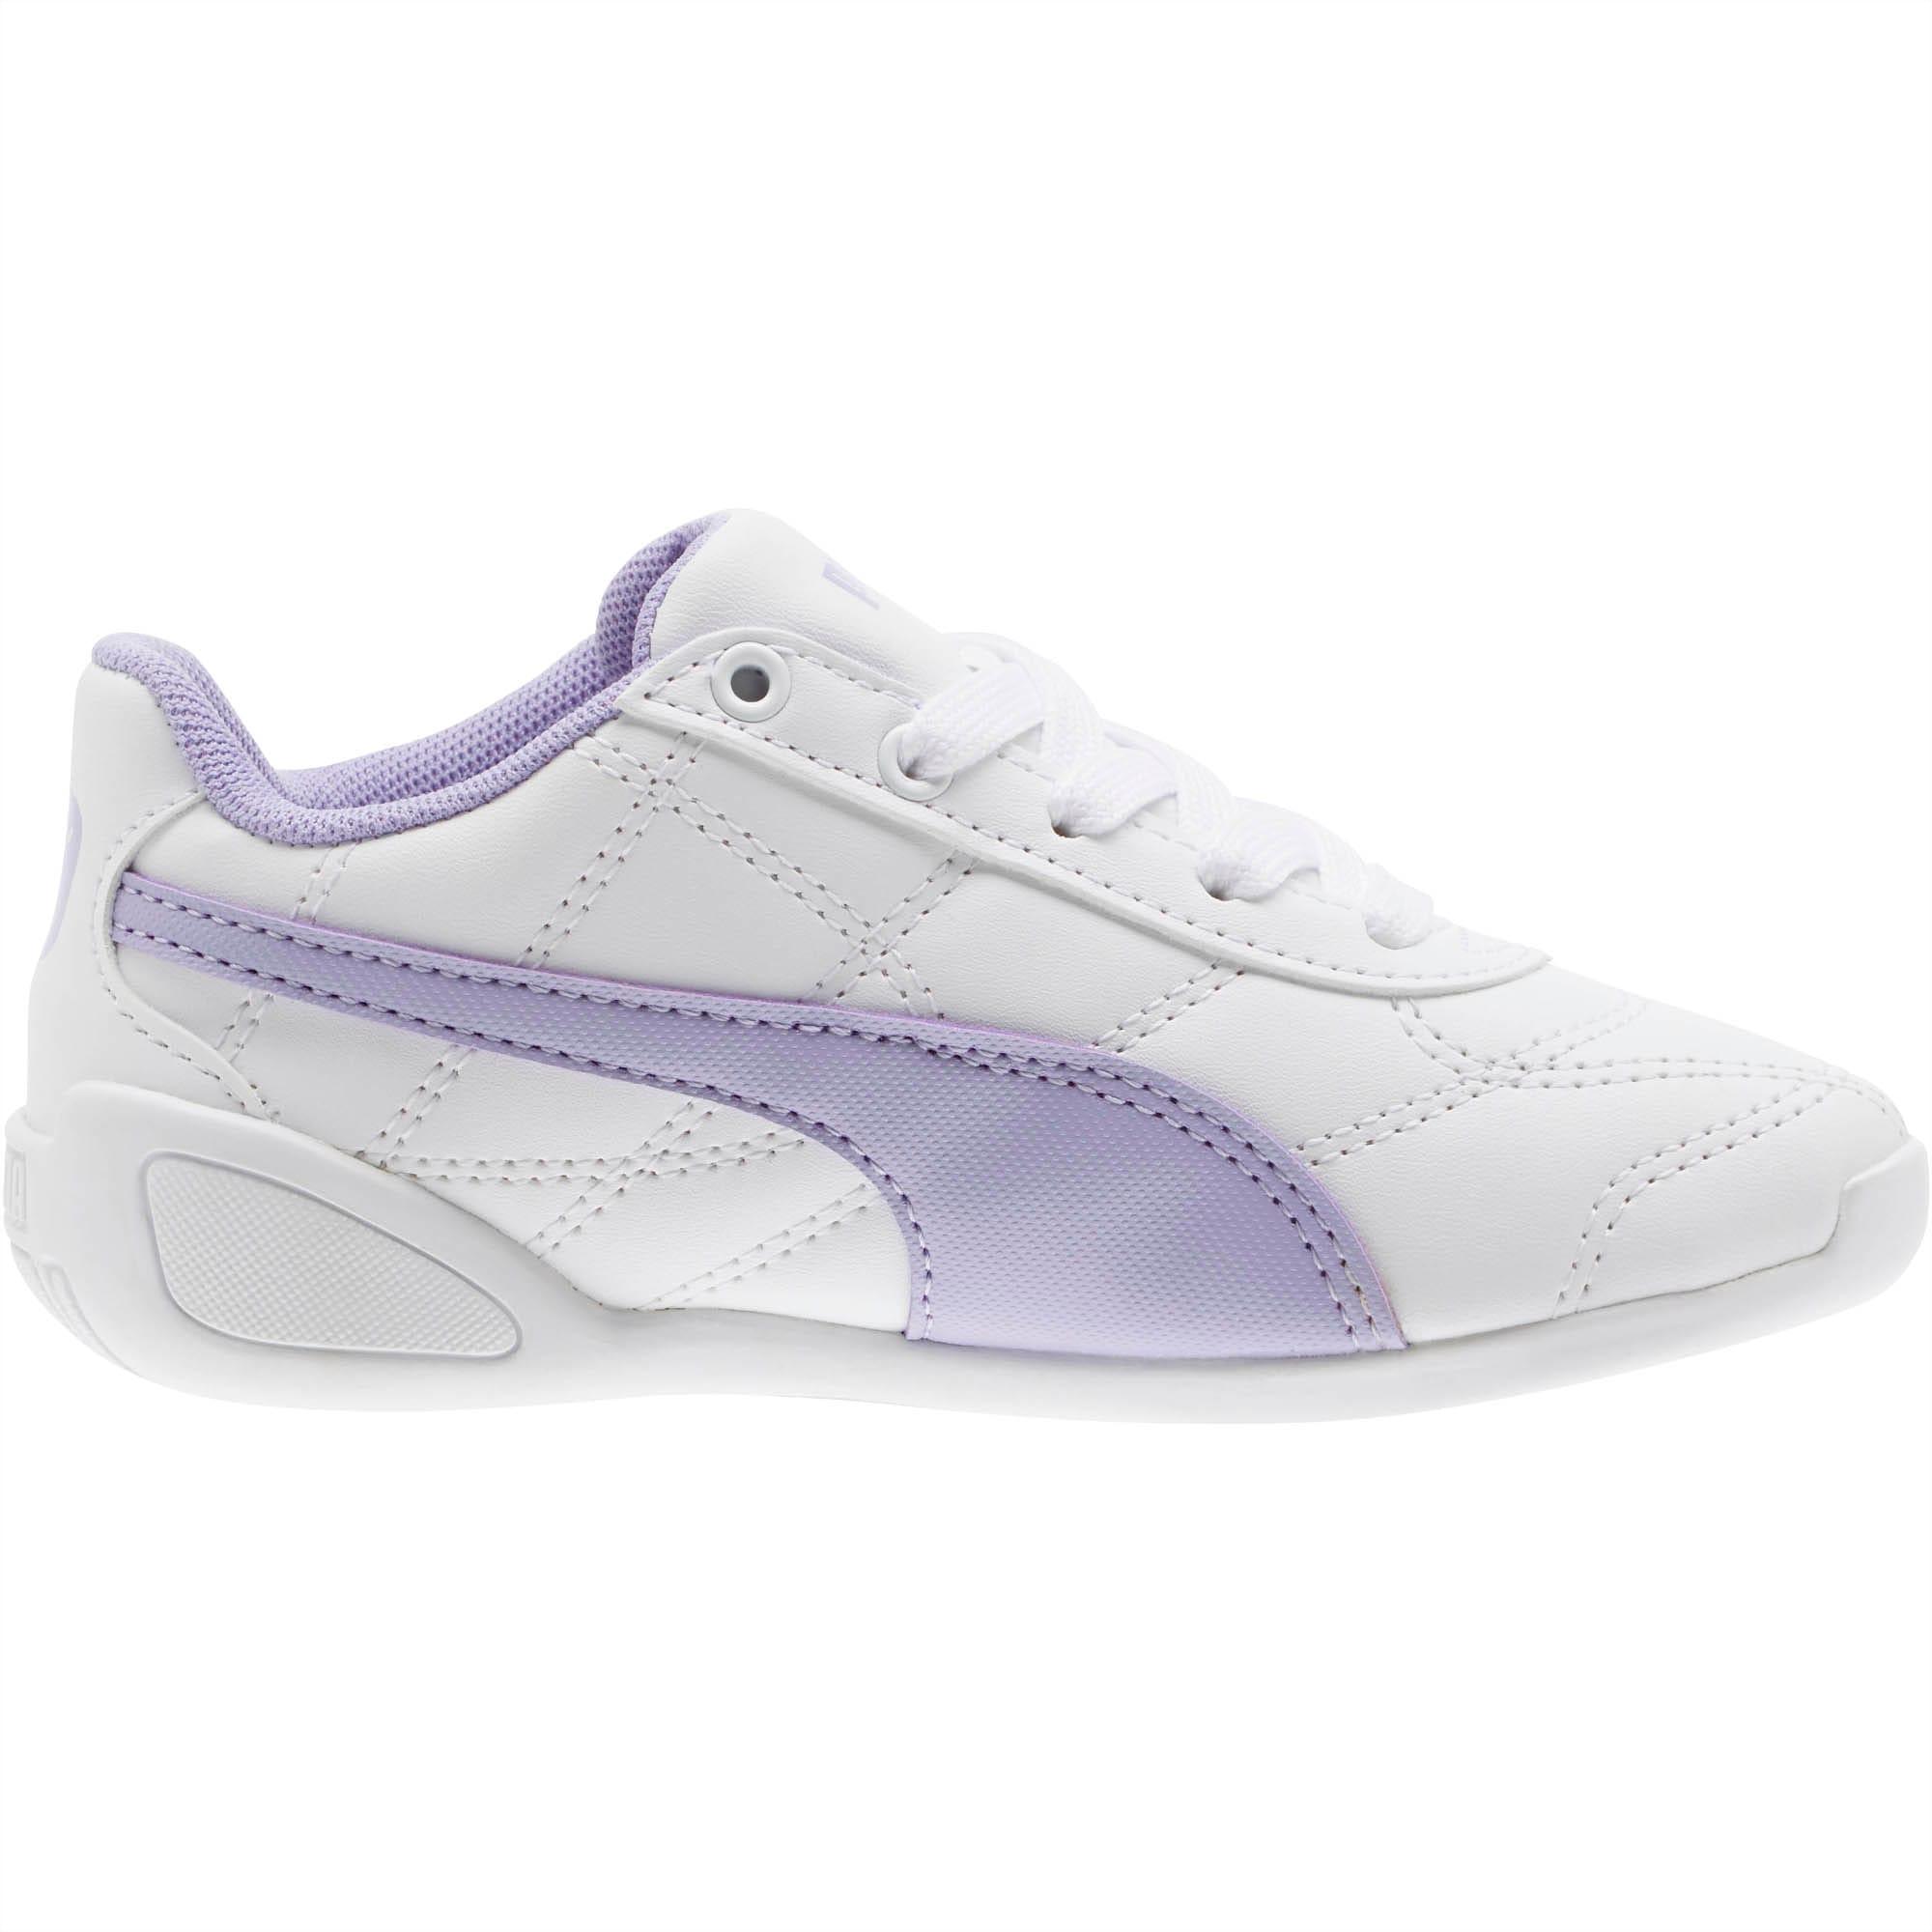 Select SZ//Color. PUMA Tune Cat 3 Kids Sneaker Little Kid